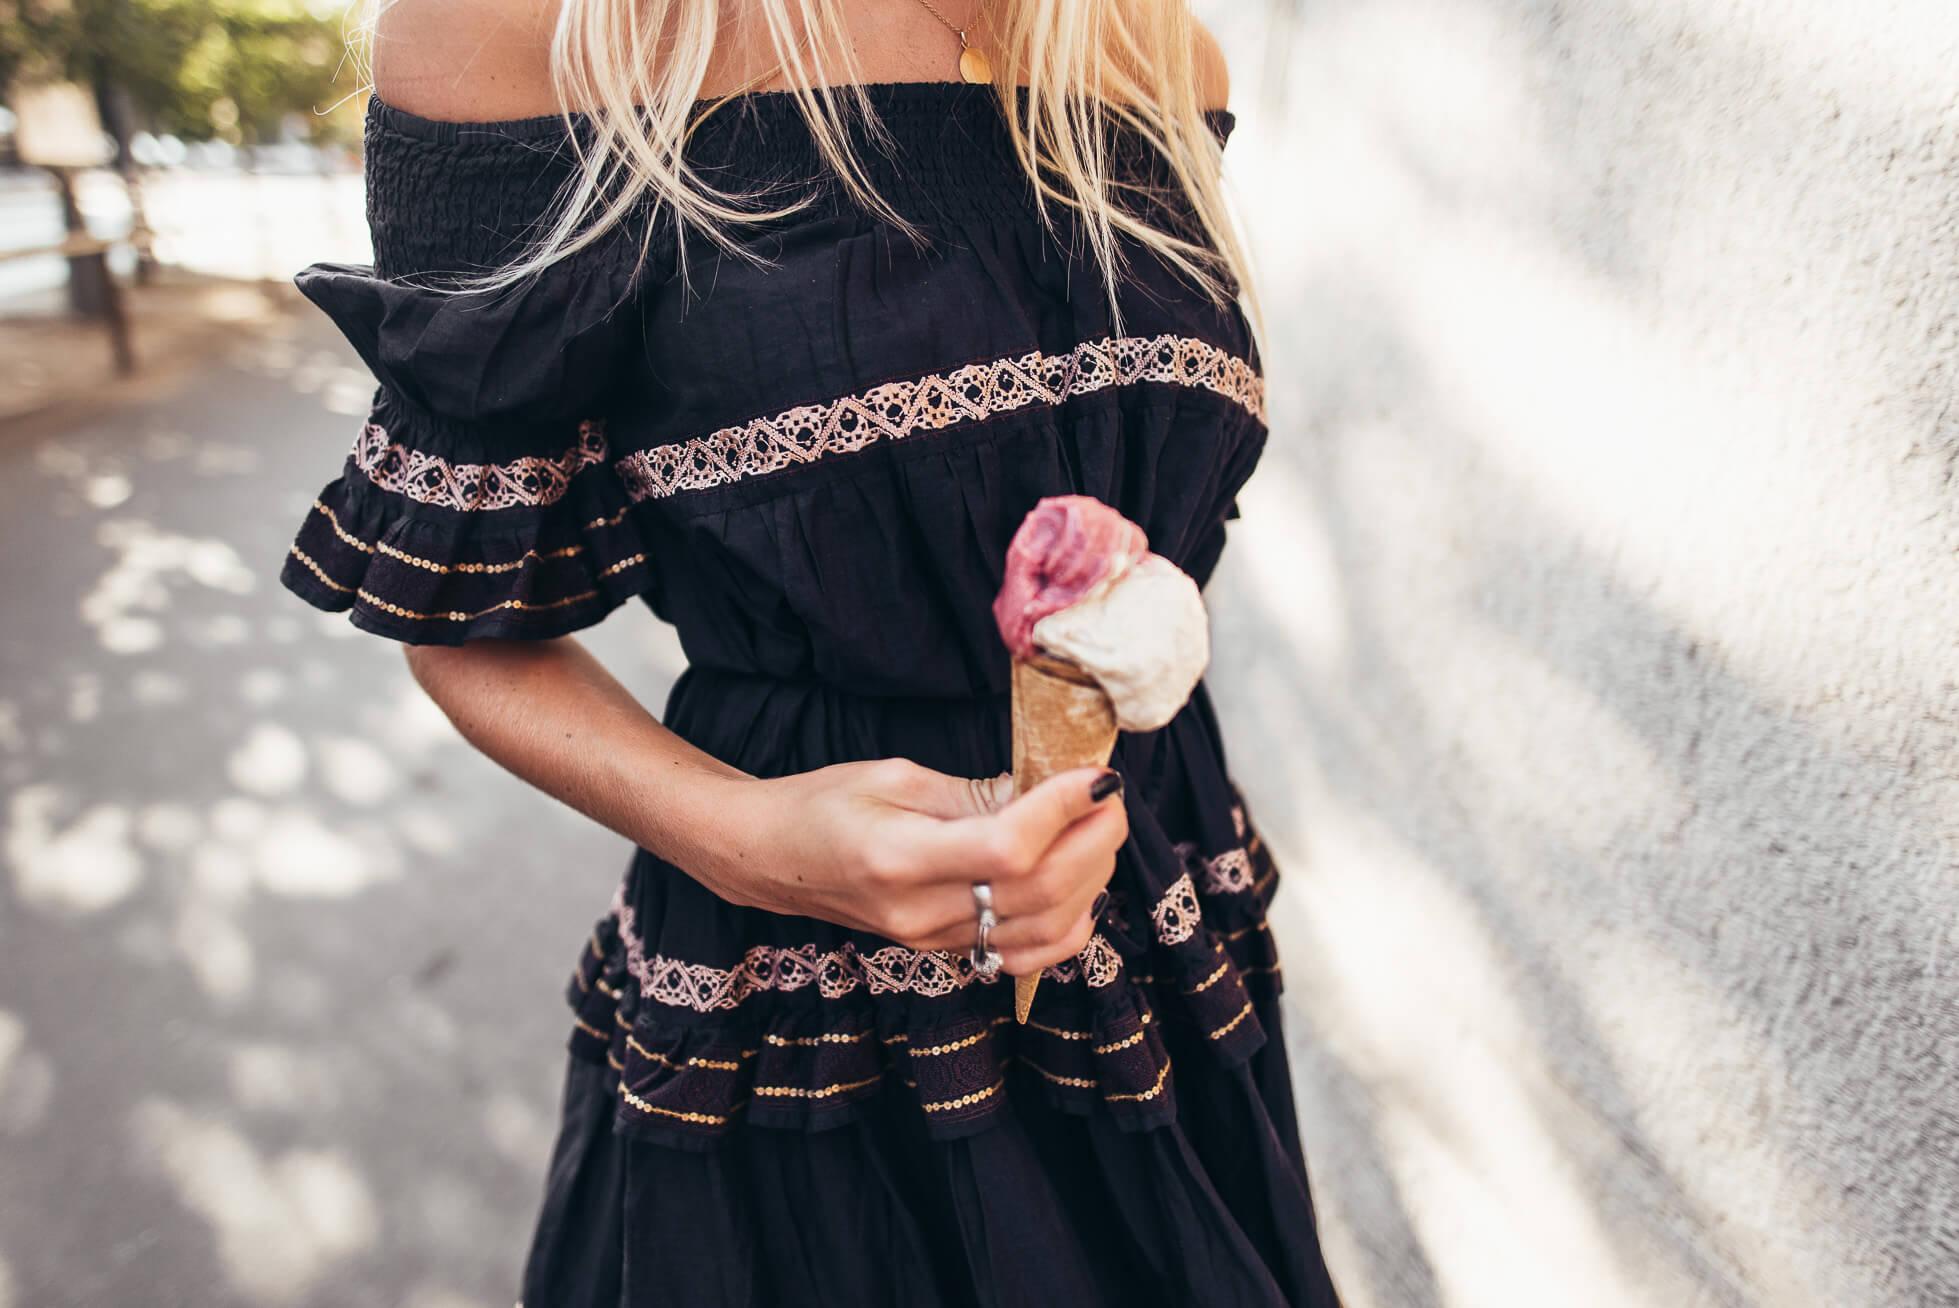 janni-deler-gelato-dress-milanDSC_1721